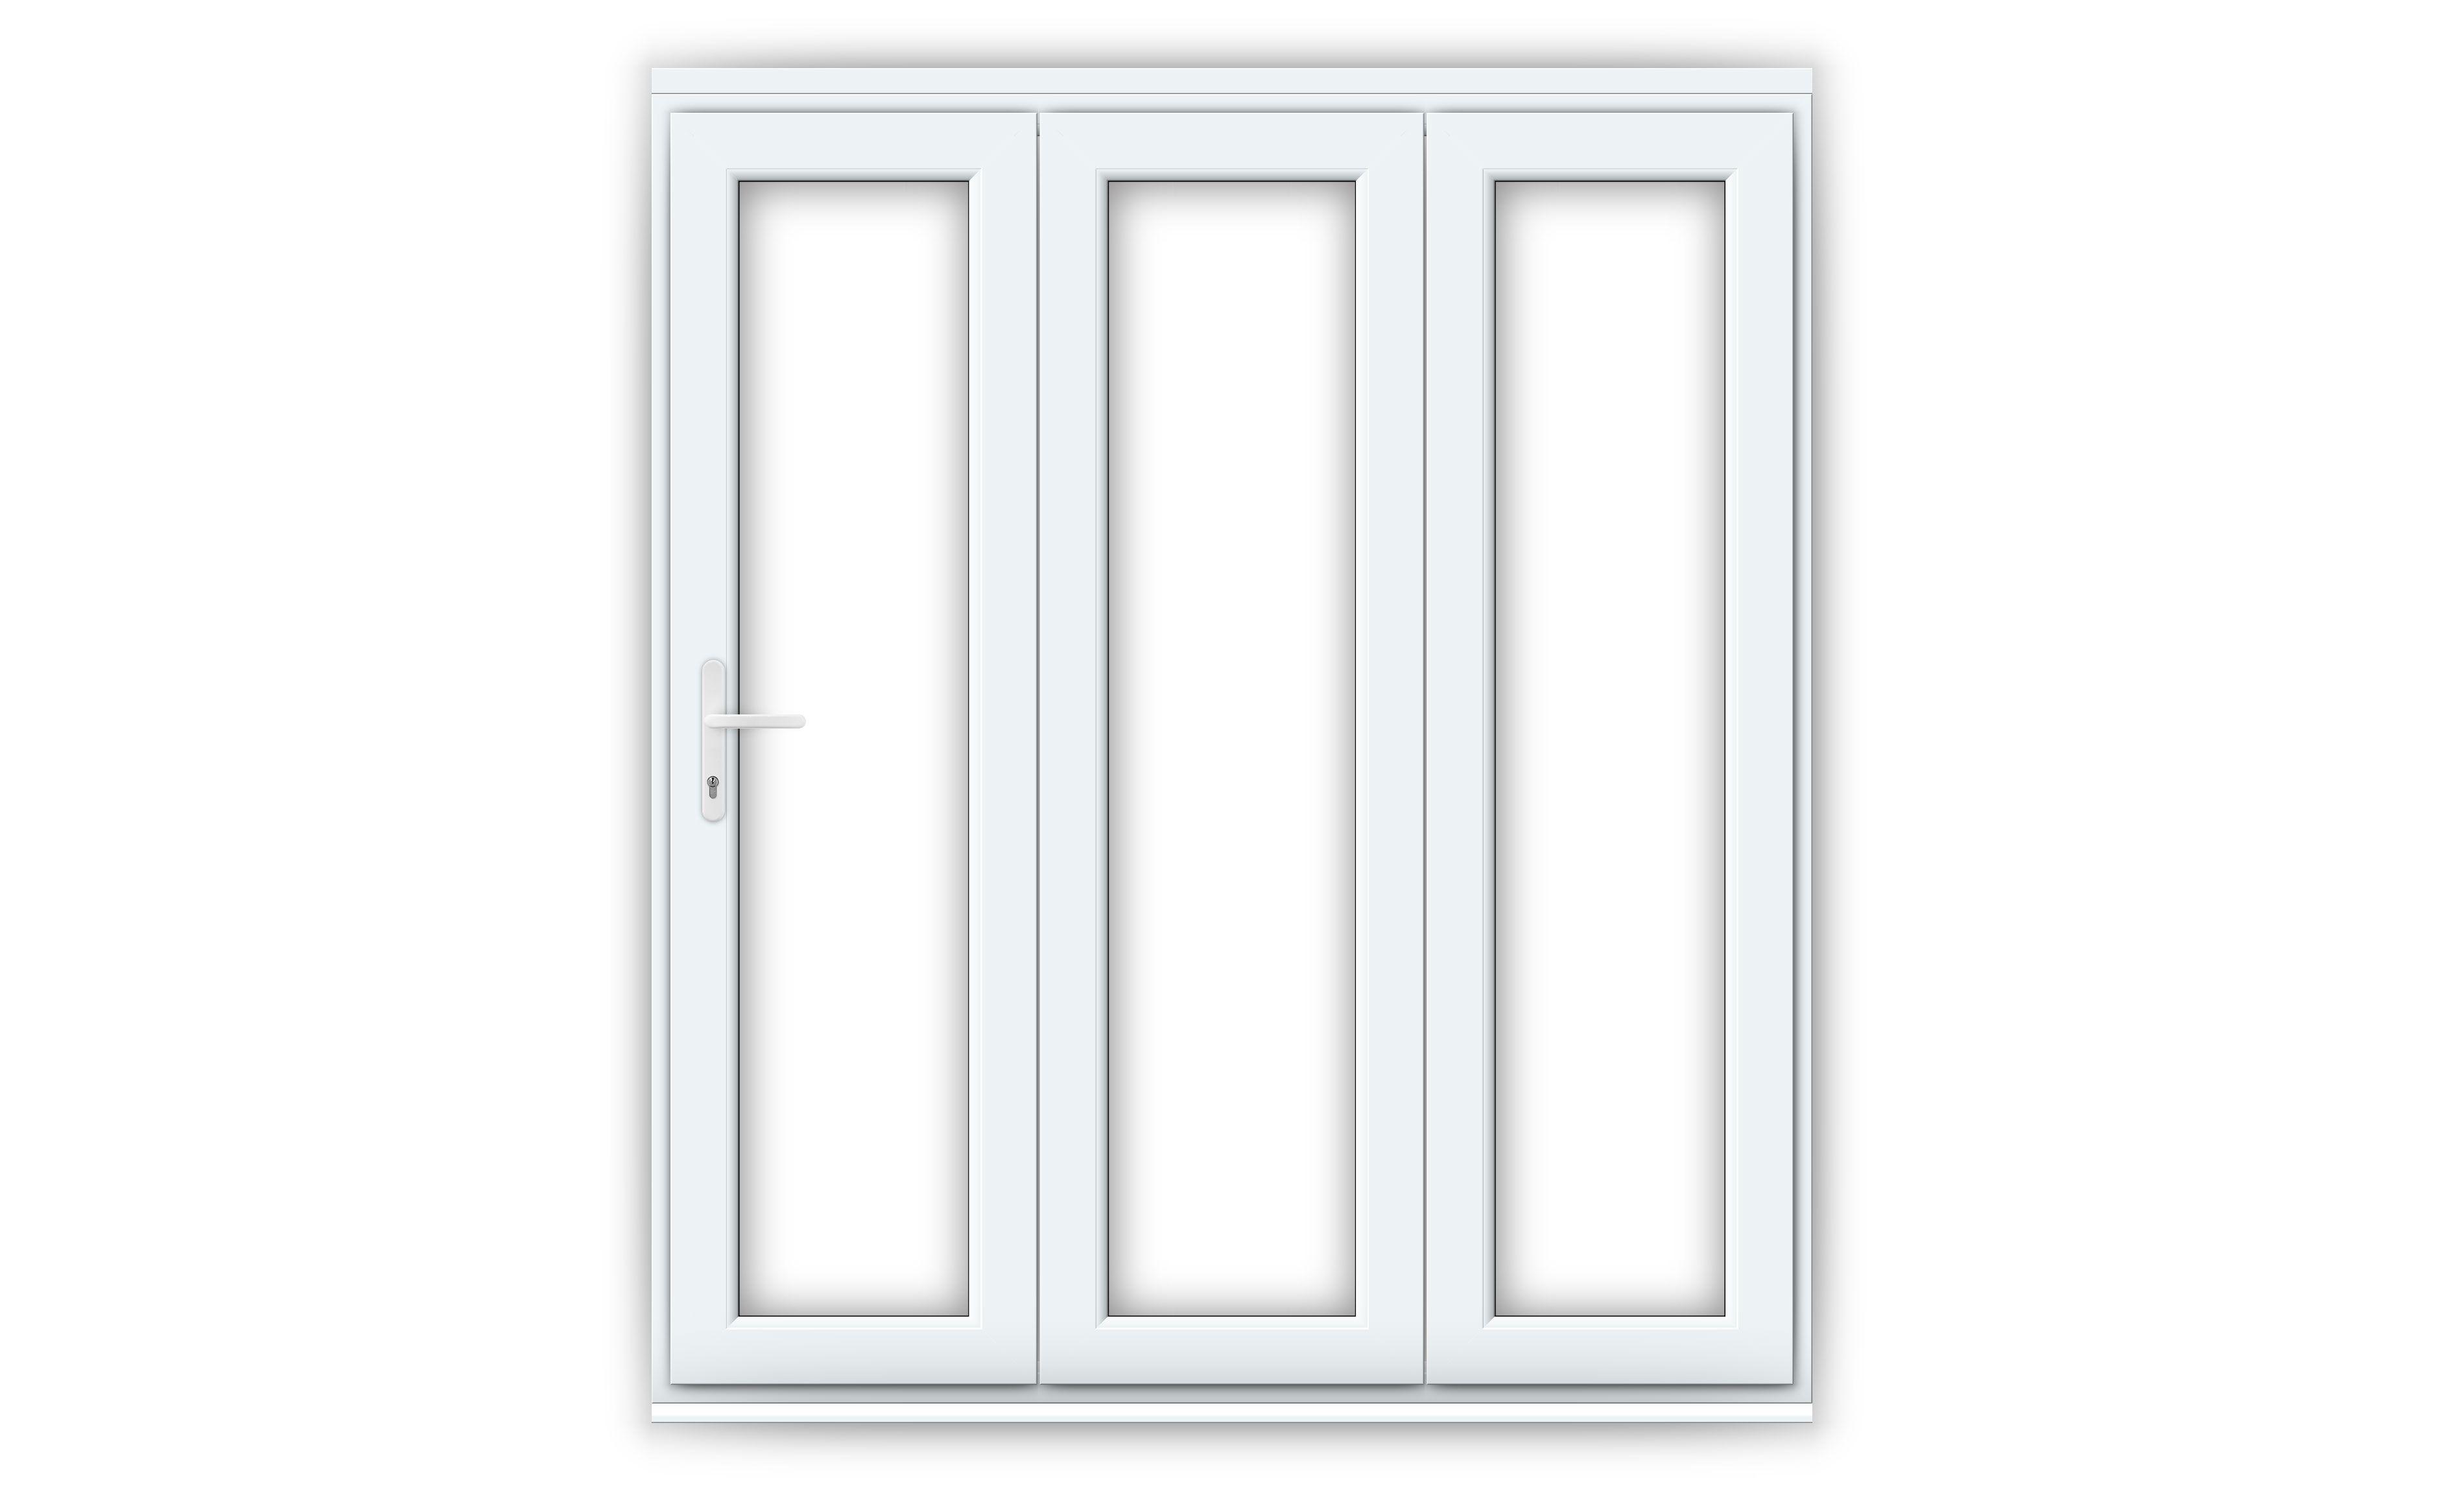 6ft White Upvc Bifold Door Set Architect Pinterest Upvc Bifold